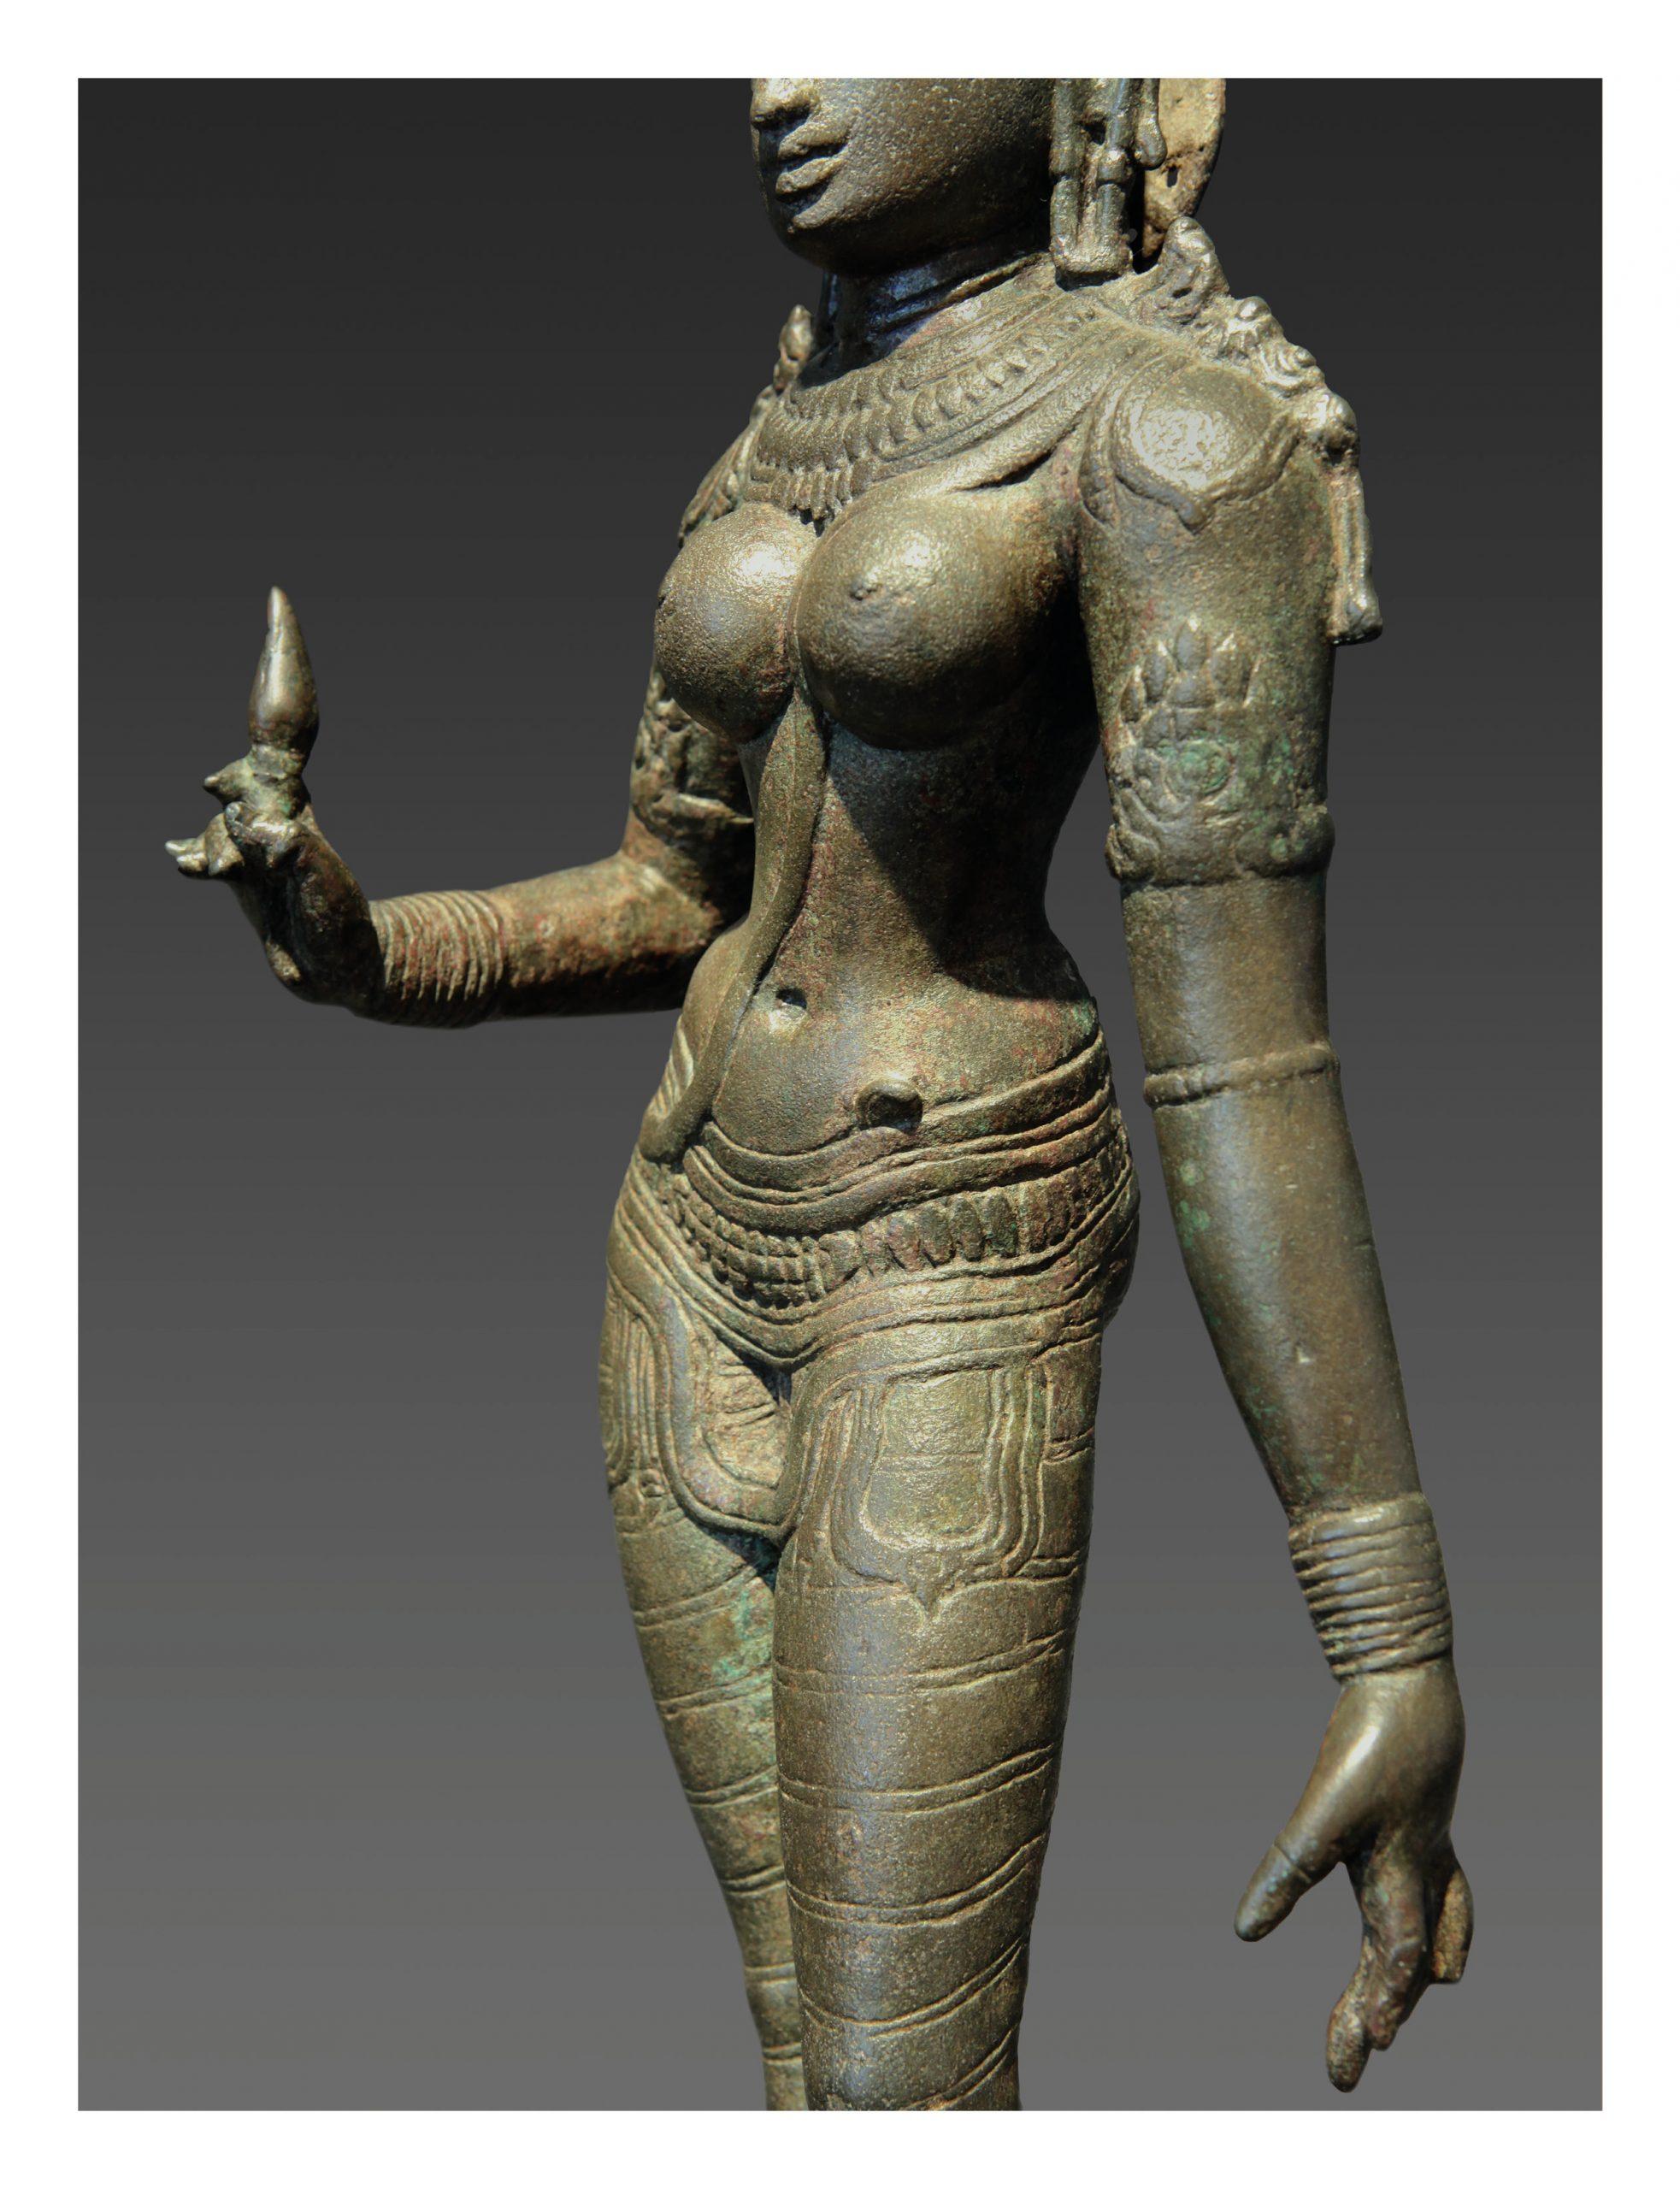 INDIA, PARVATI (DETAIL), CHOLA DYNASTY, 11TH CENTURY, H.: 63CM